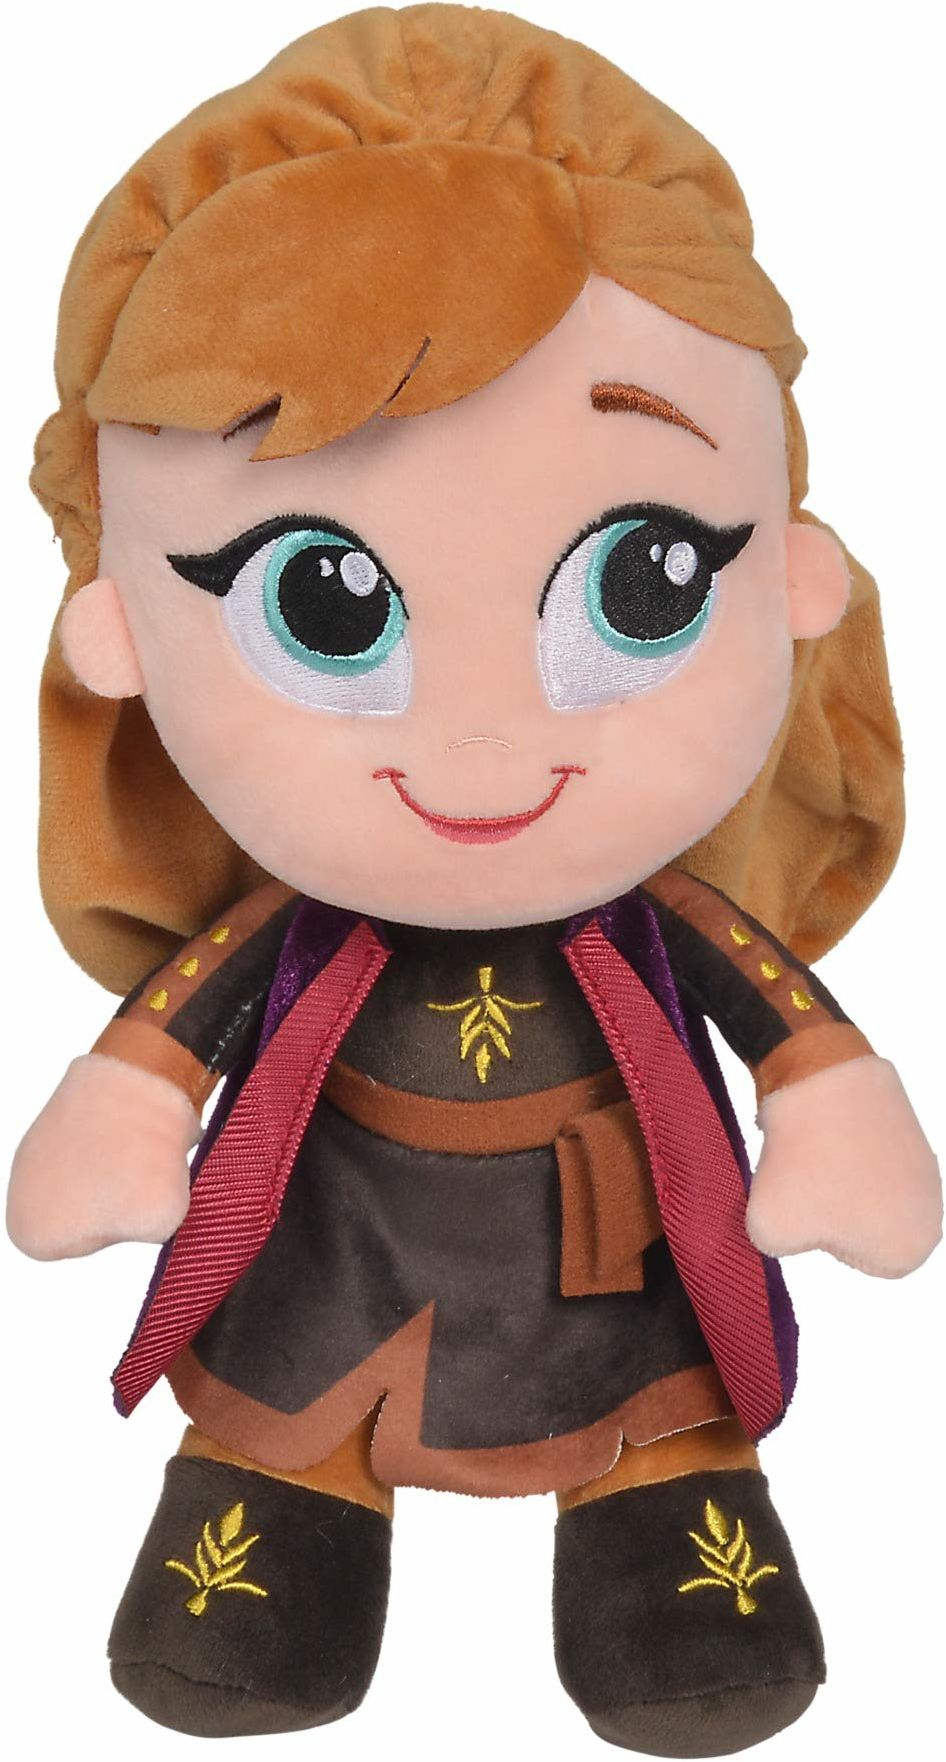 Simba 6315877554 Disney Frozen 2, Maskotka Chunky Anna 6315877554